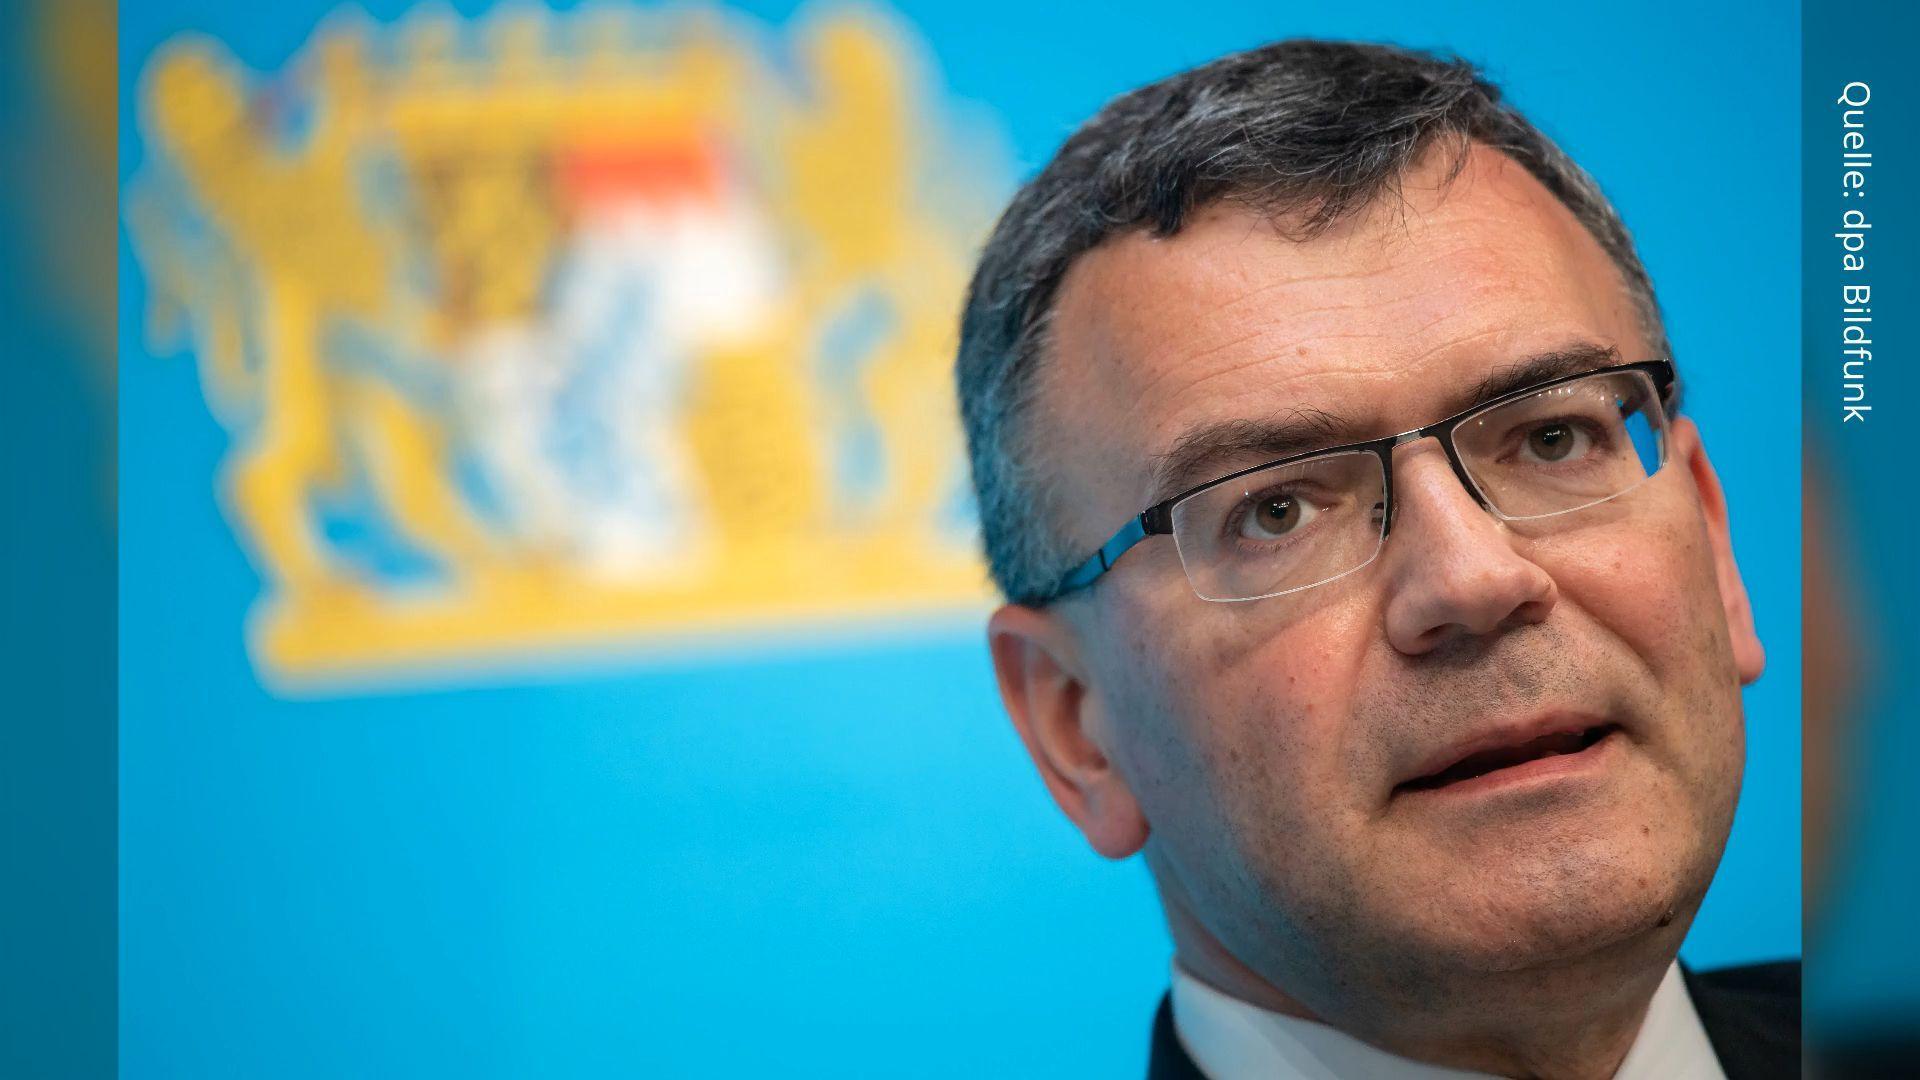 Coronavirus: Bayerisches Kabinett verkündet Lockerungen